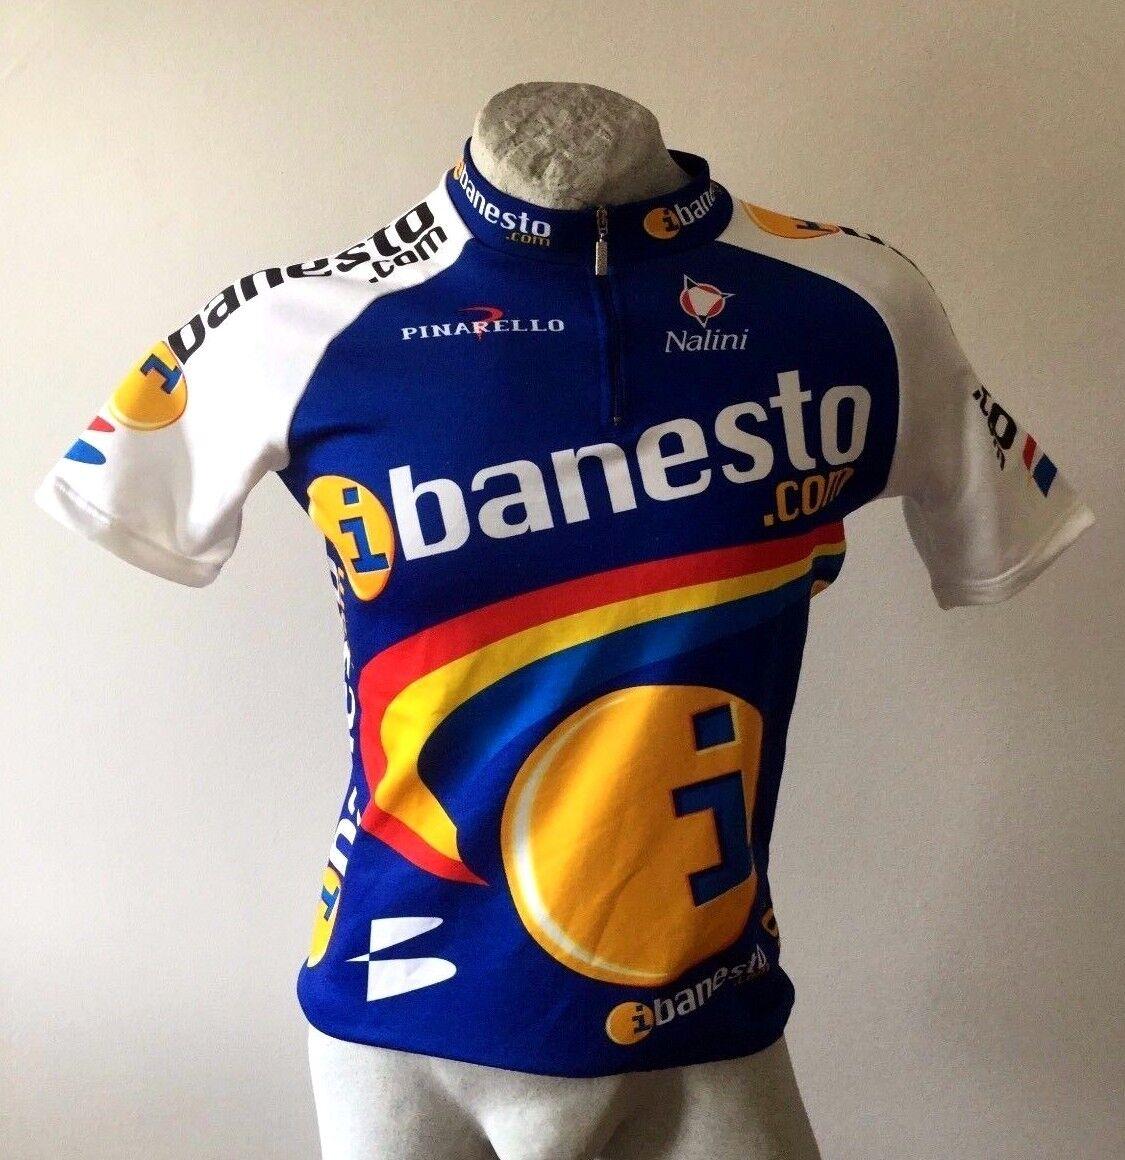 MAGLIA CICLISMO SHIRT BANESTO NALINI PINARELLO TRIKOT JERSEY SHIRT CICLISMO CYCLING VINTAGE 9c8ff4